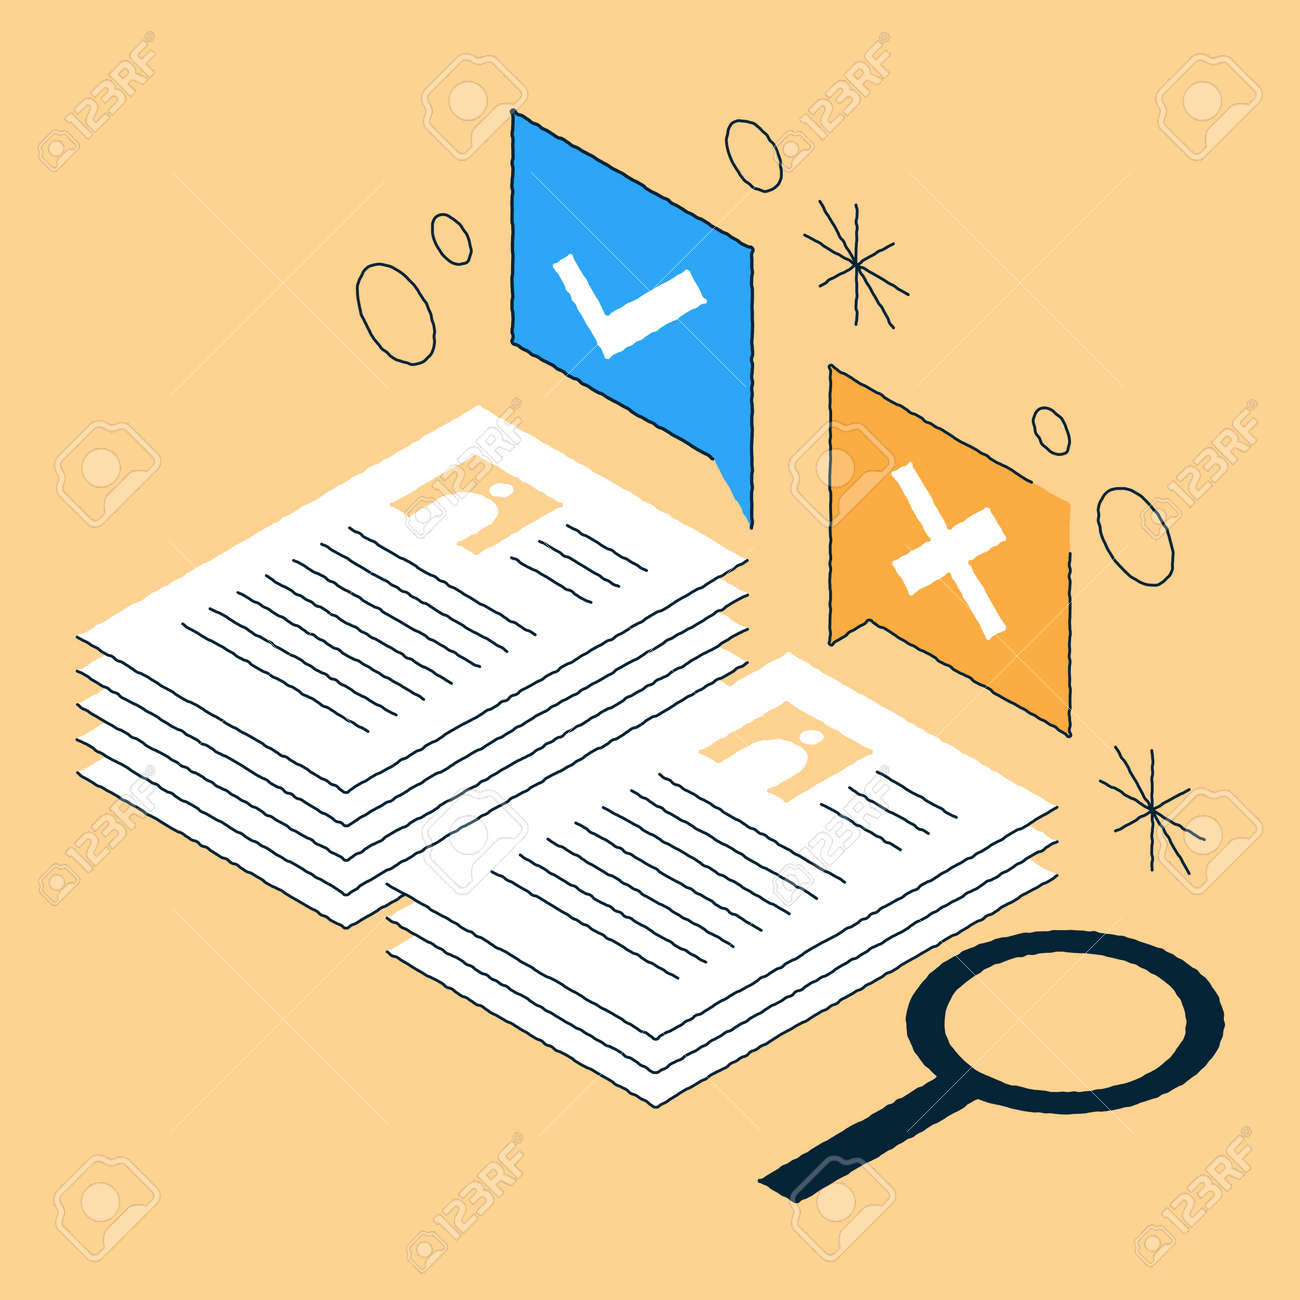 Job Recruiting Isometric Illustration - 171679943